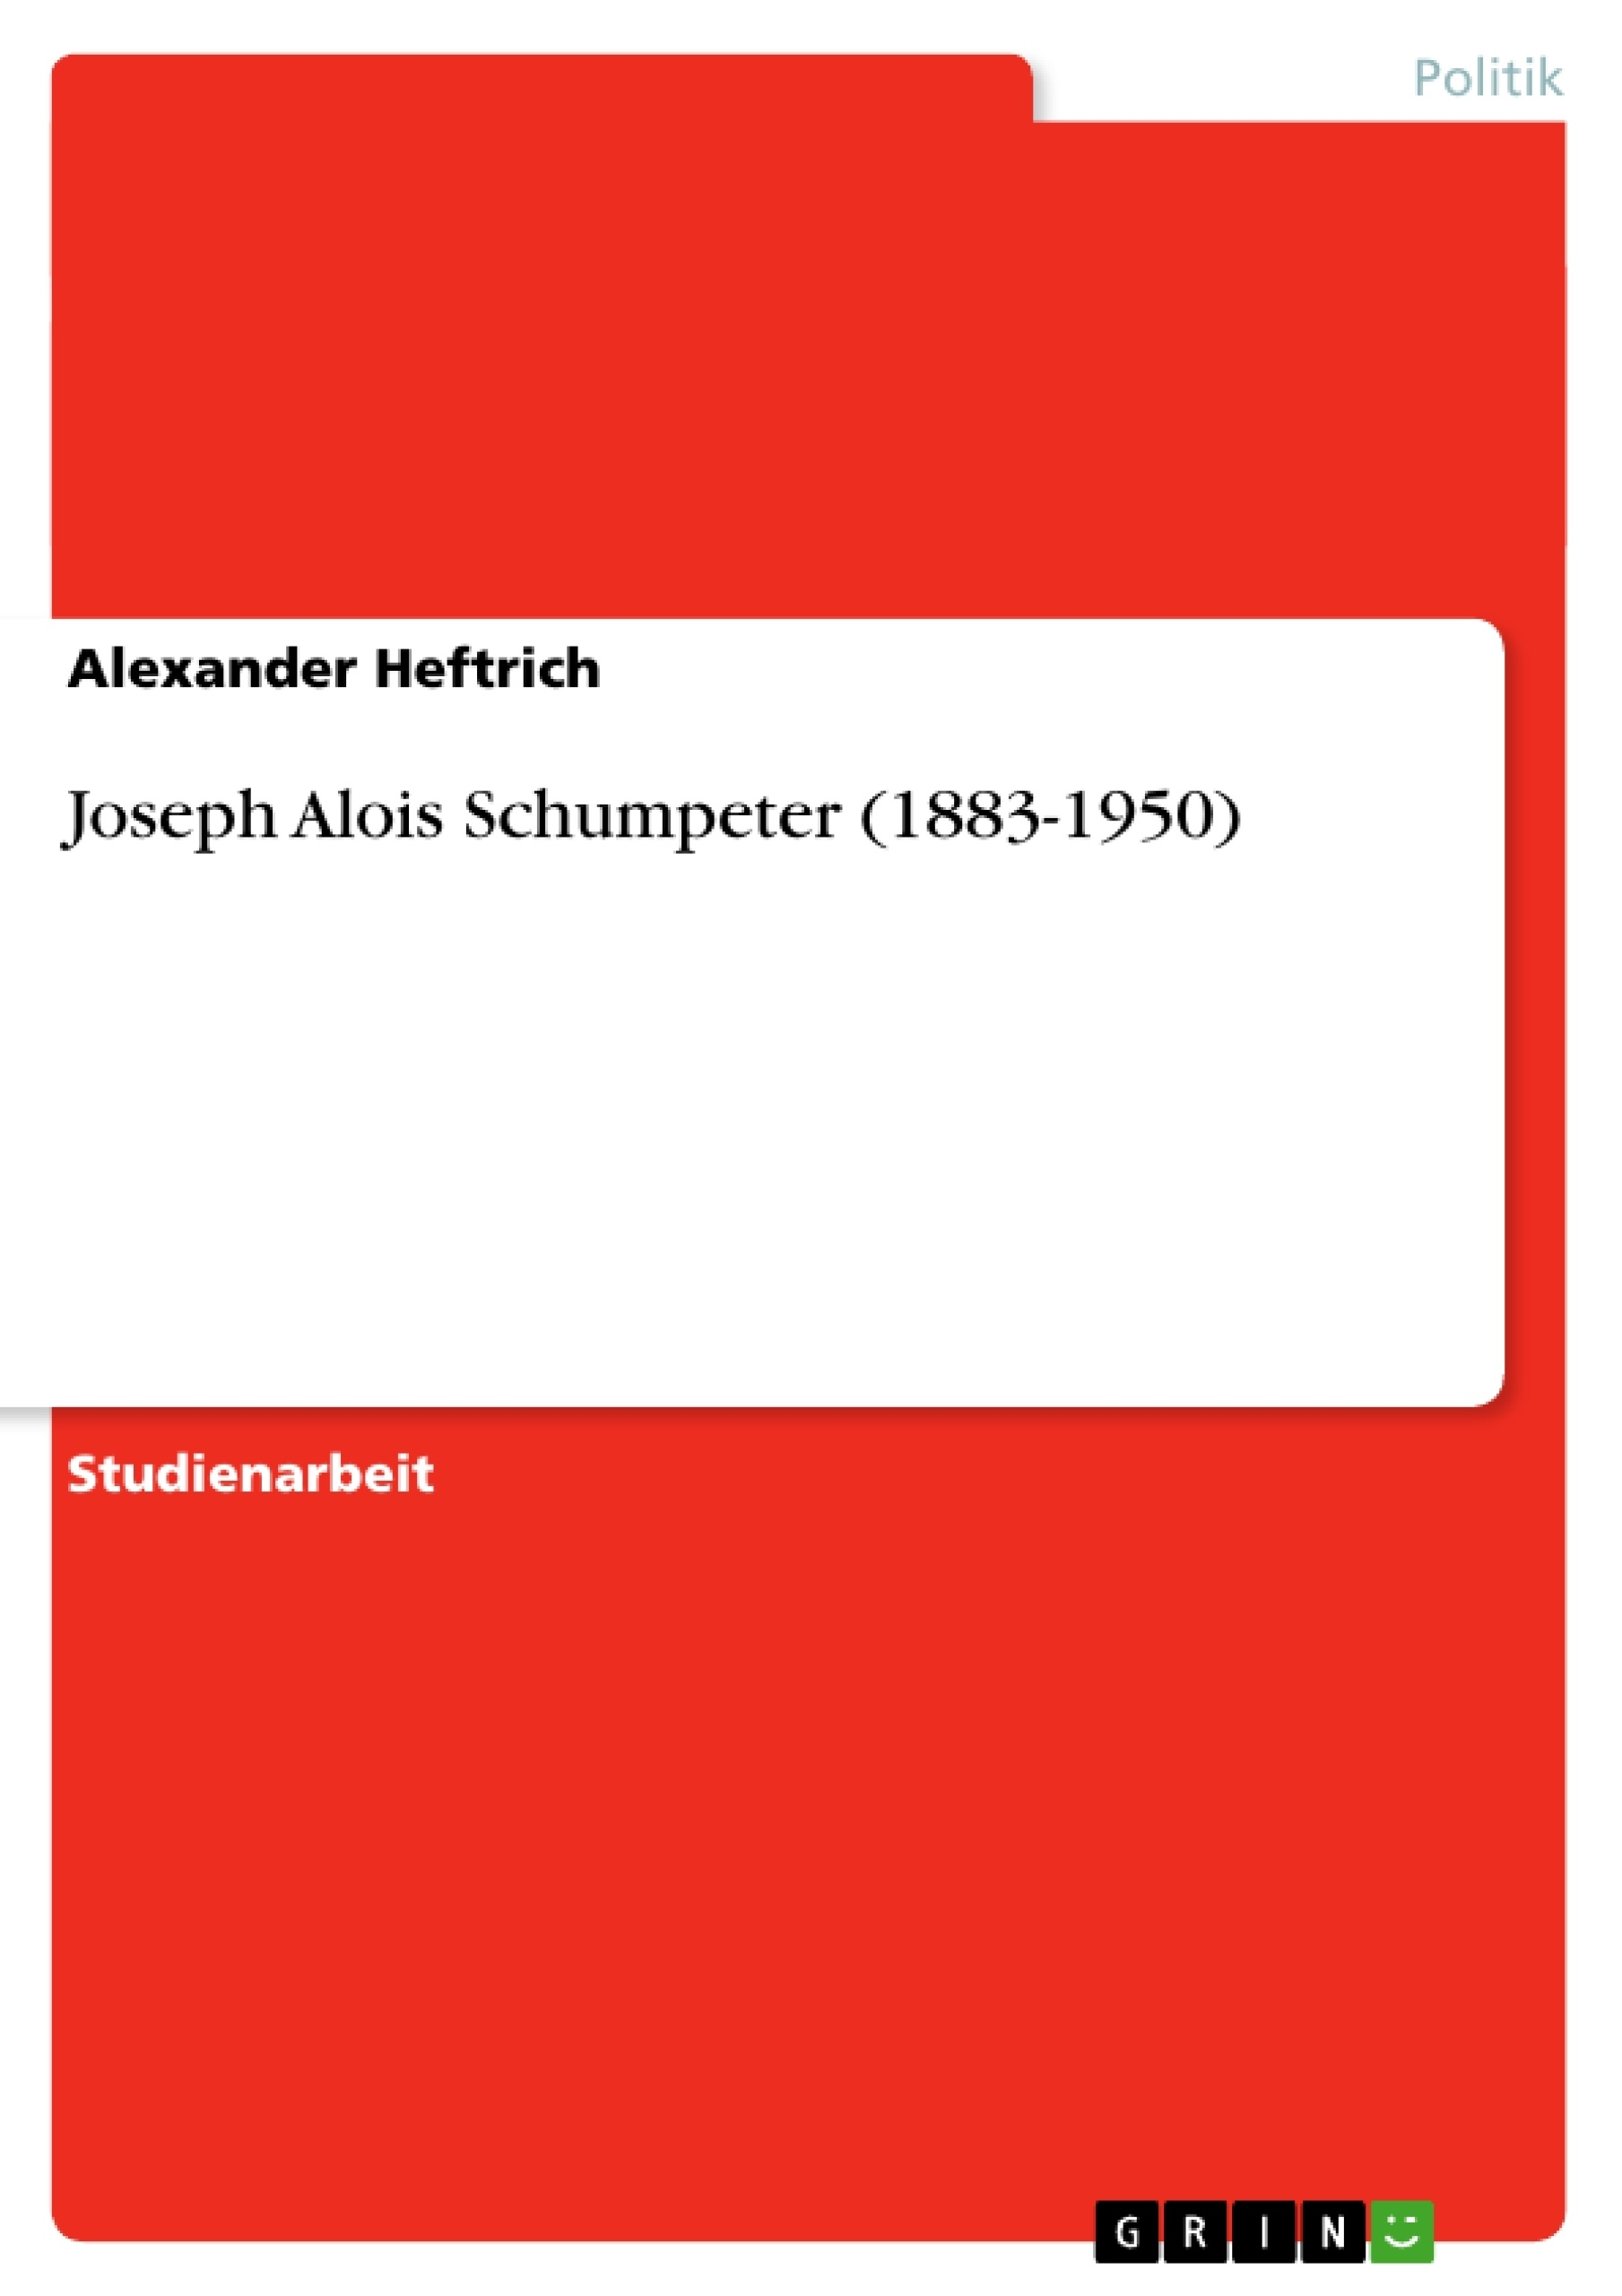 Titel: Joseph Alois Schumpeter (1883-1950)